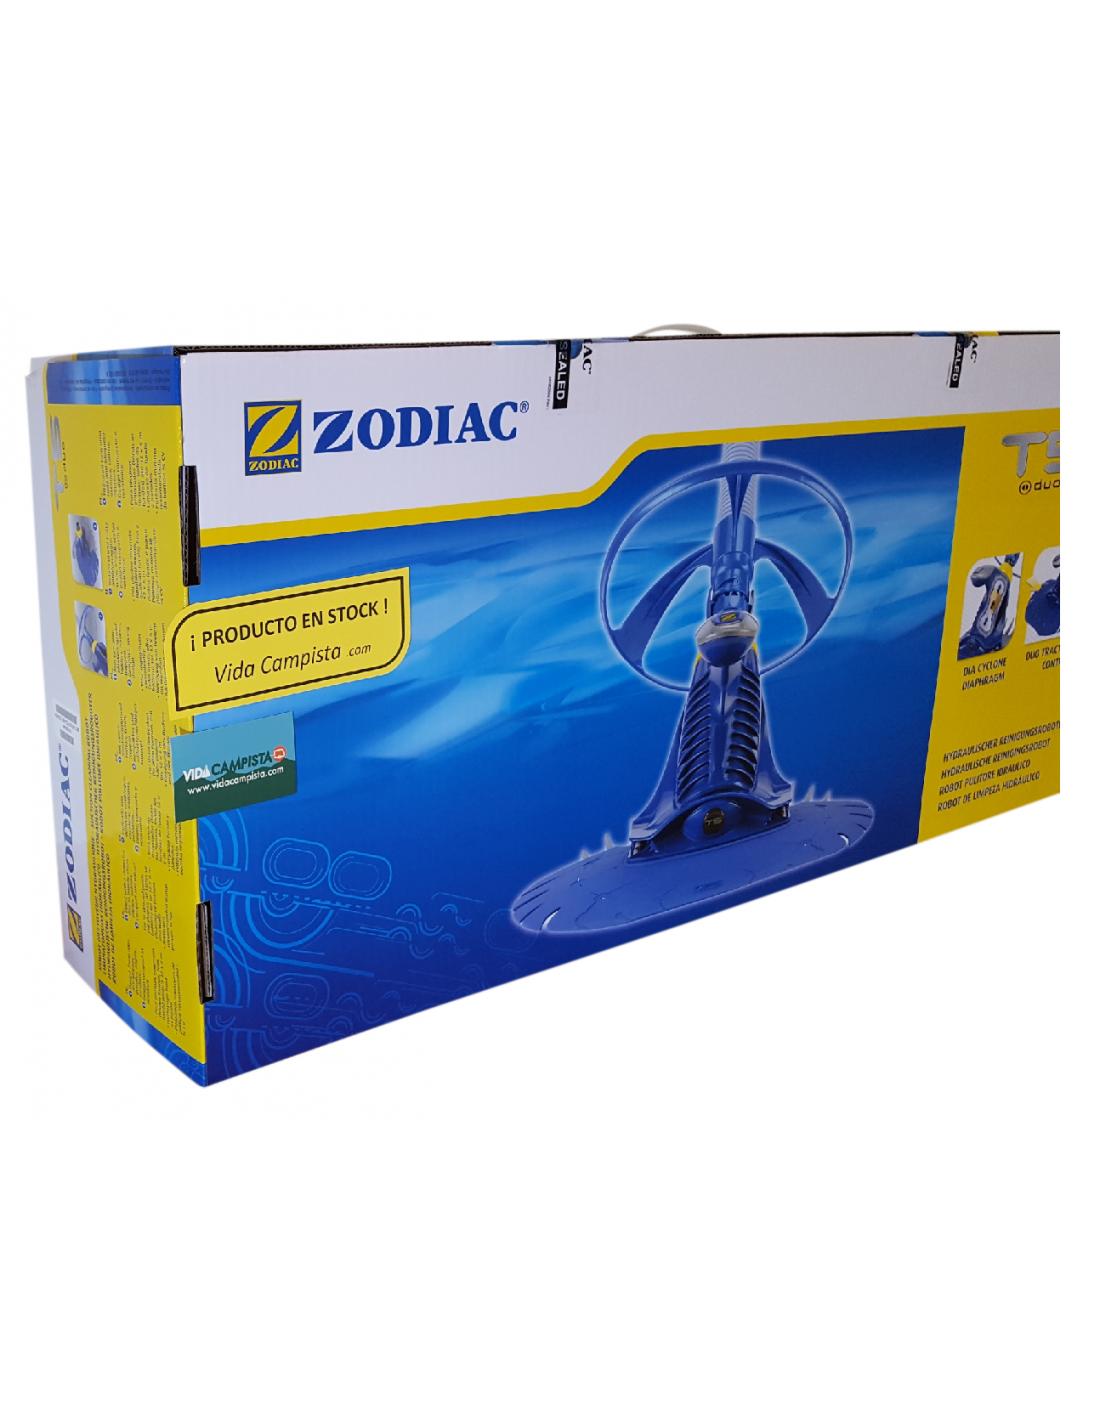 Zodiac t5 duo limpiafondos autom tico pulpo piscina for Pulpo para piscina